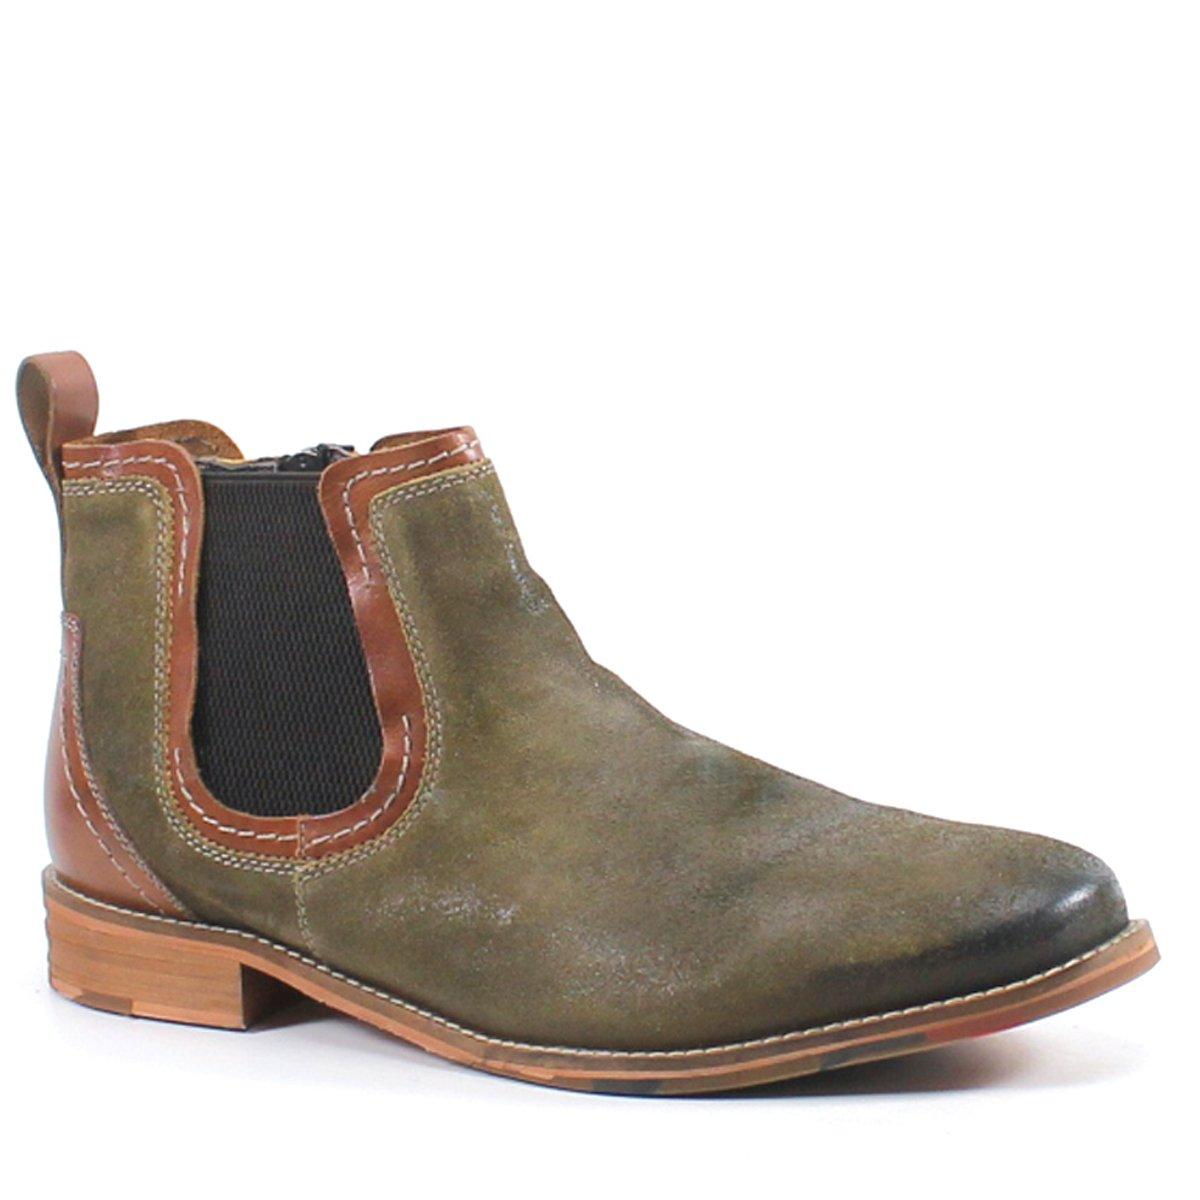 TESTOSTERONE Apple Jay Leather Boot (42, Tan)